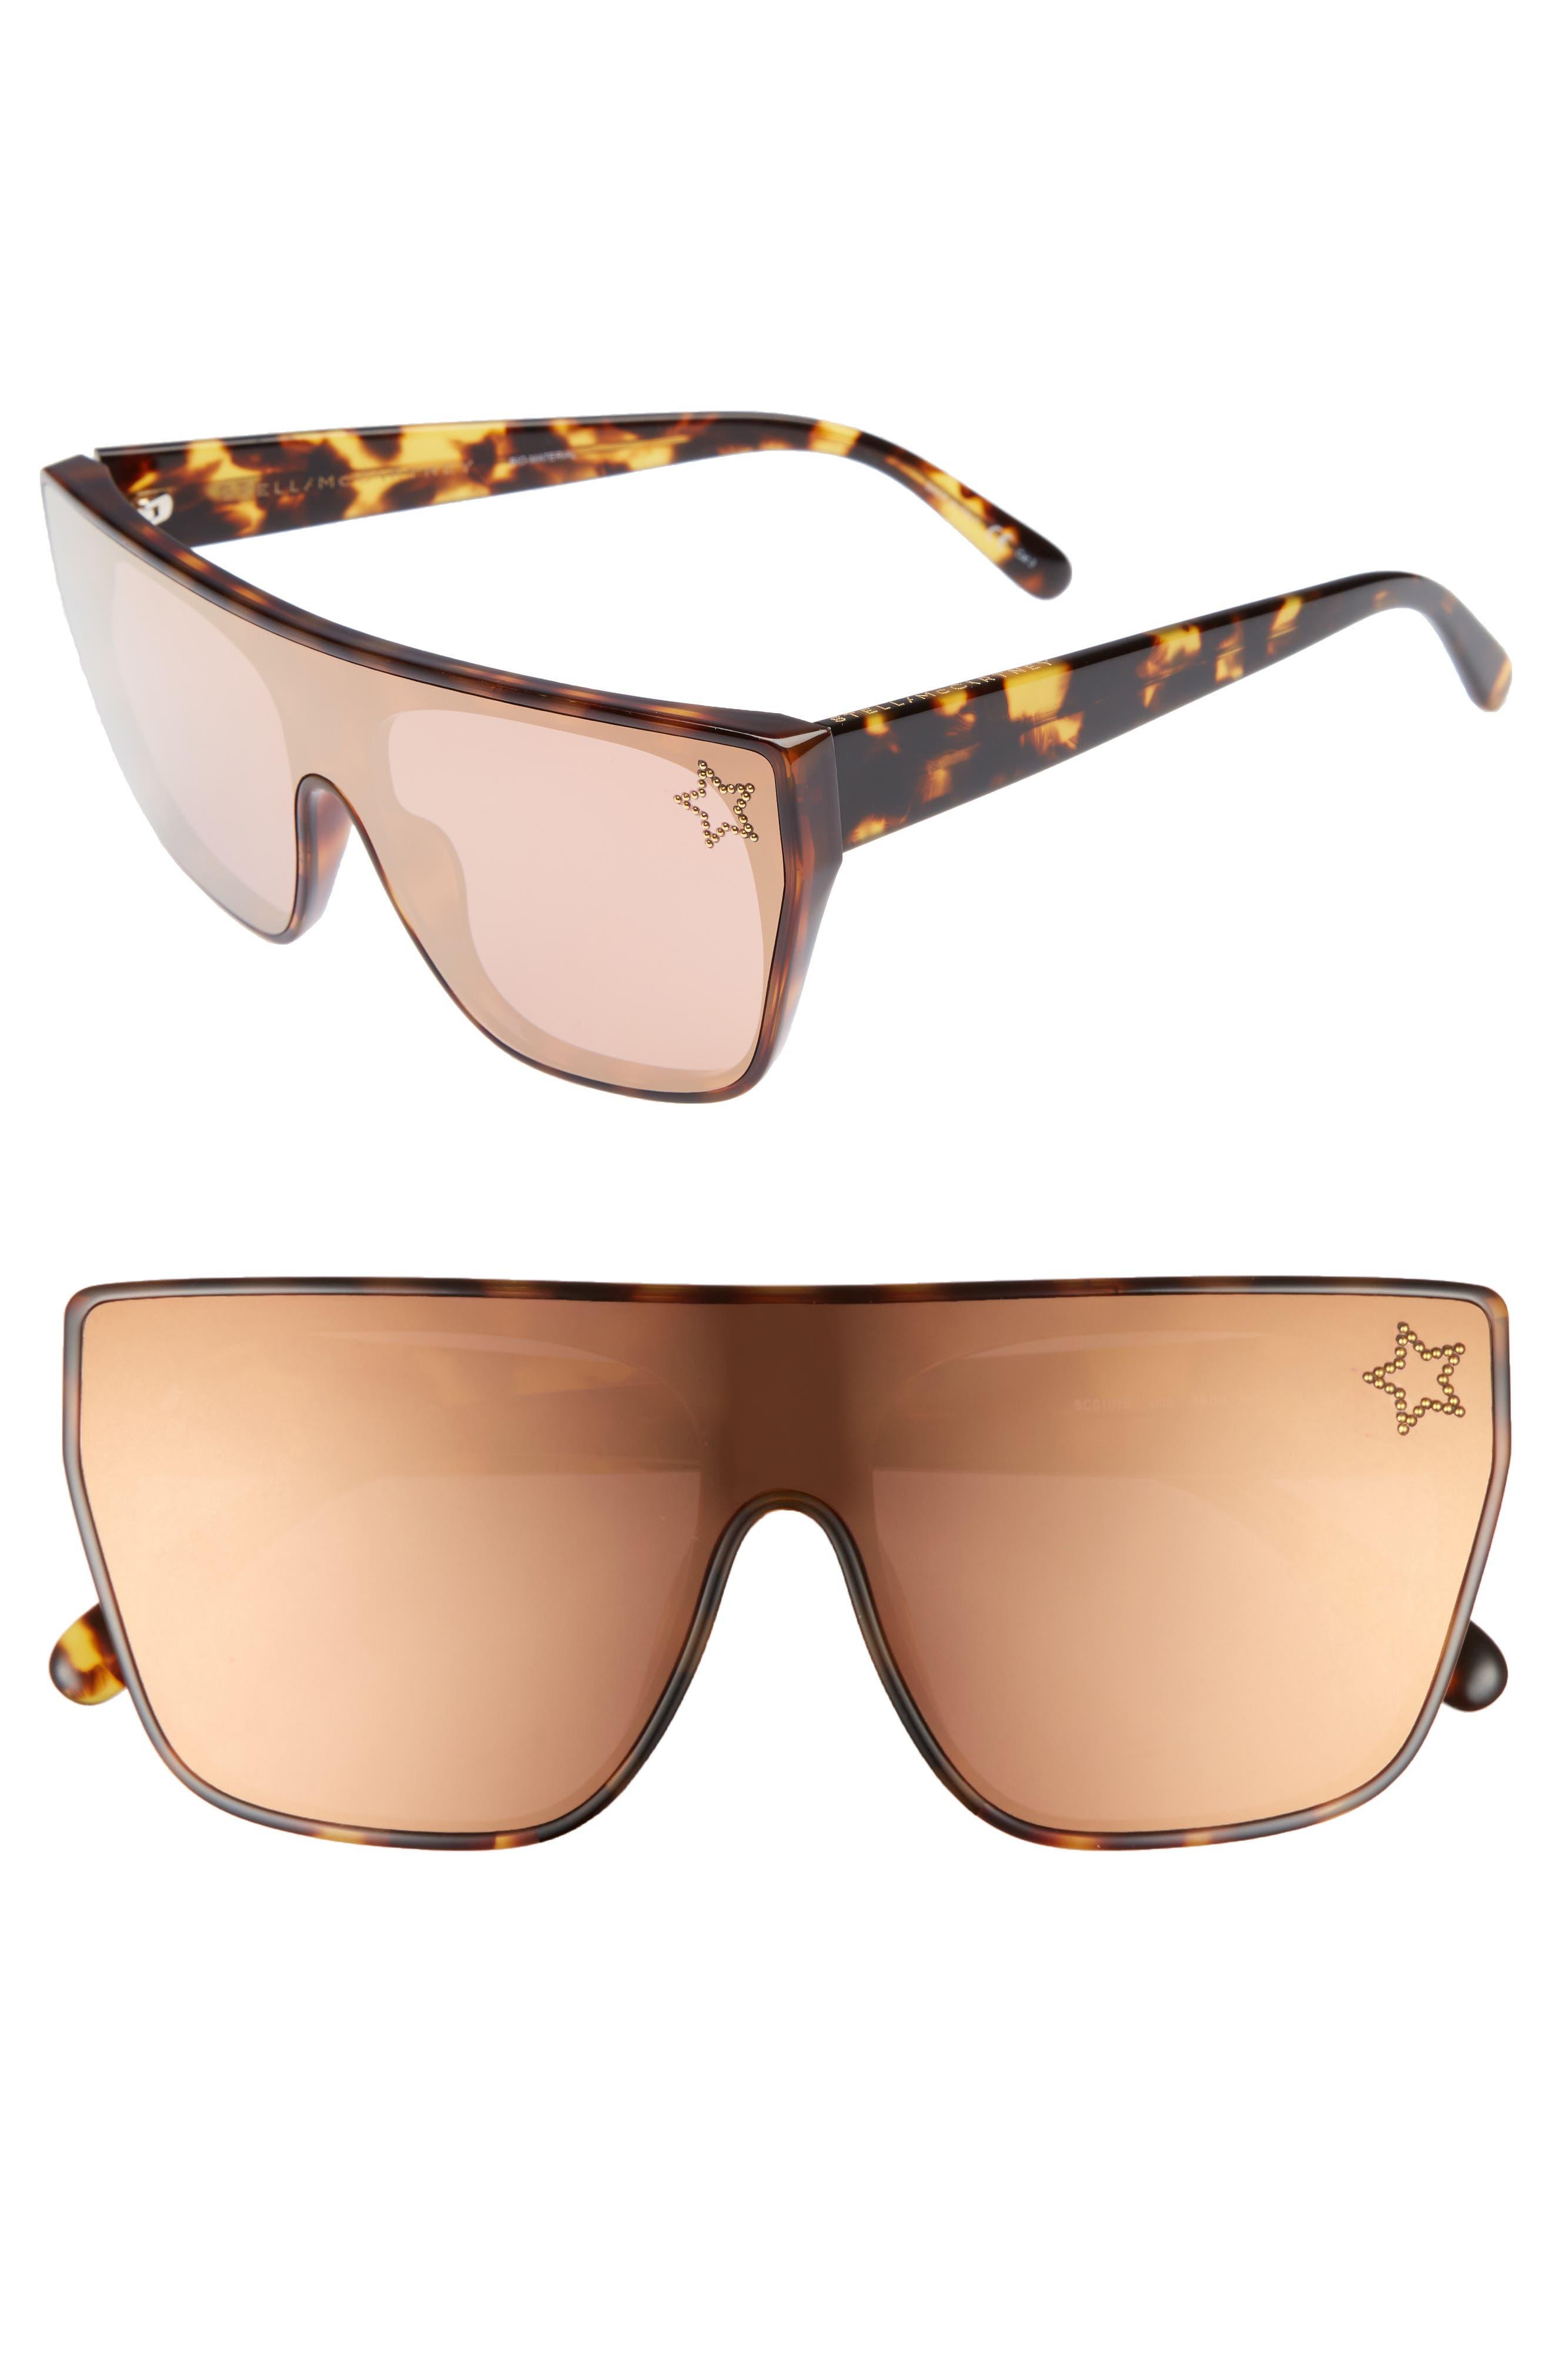 99mm Flat Top Sunglasses,                             Main thumbnail 1, color,                             Blonde Avana